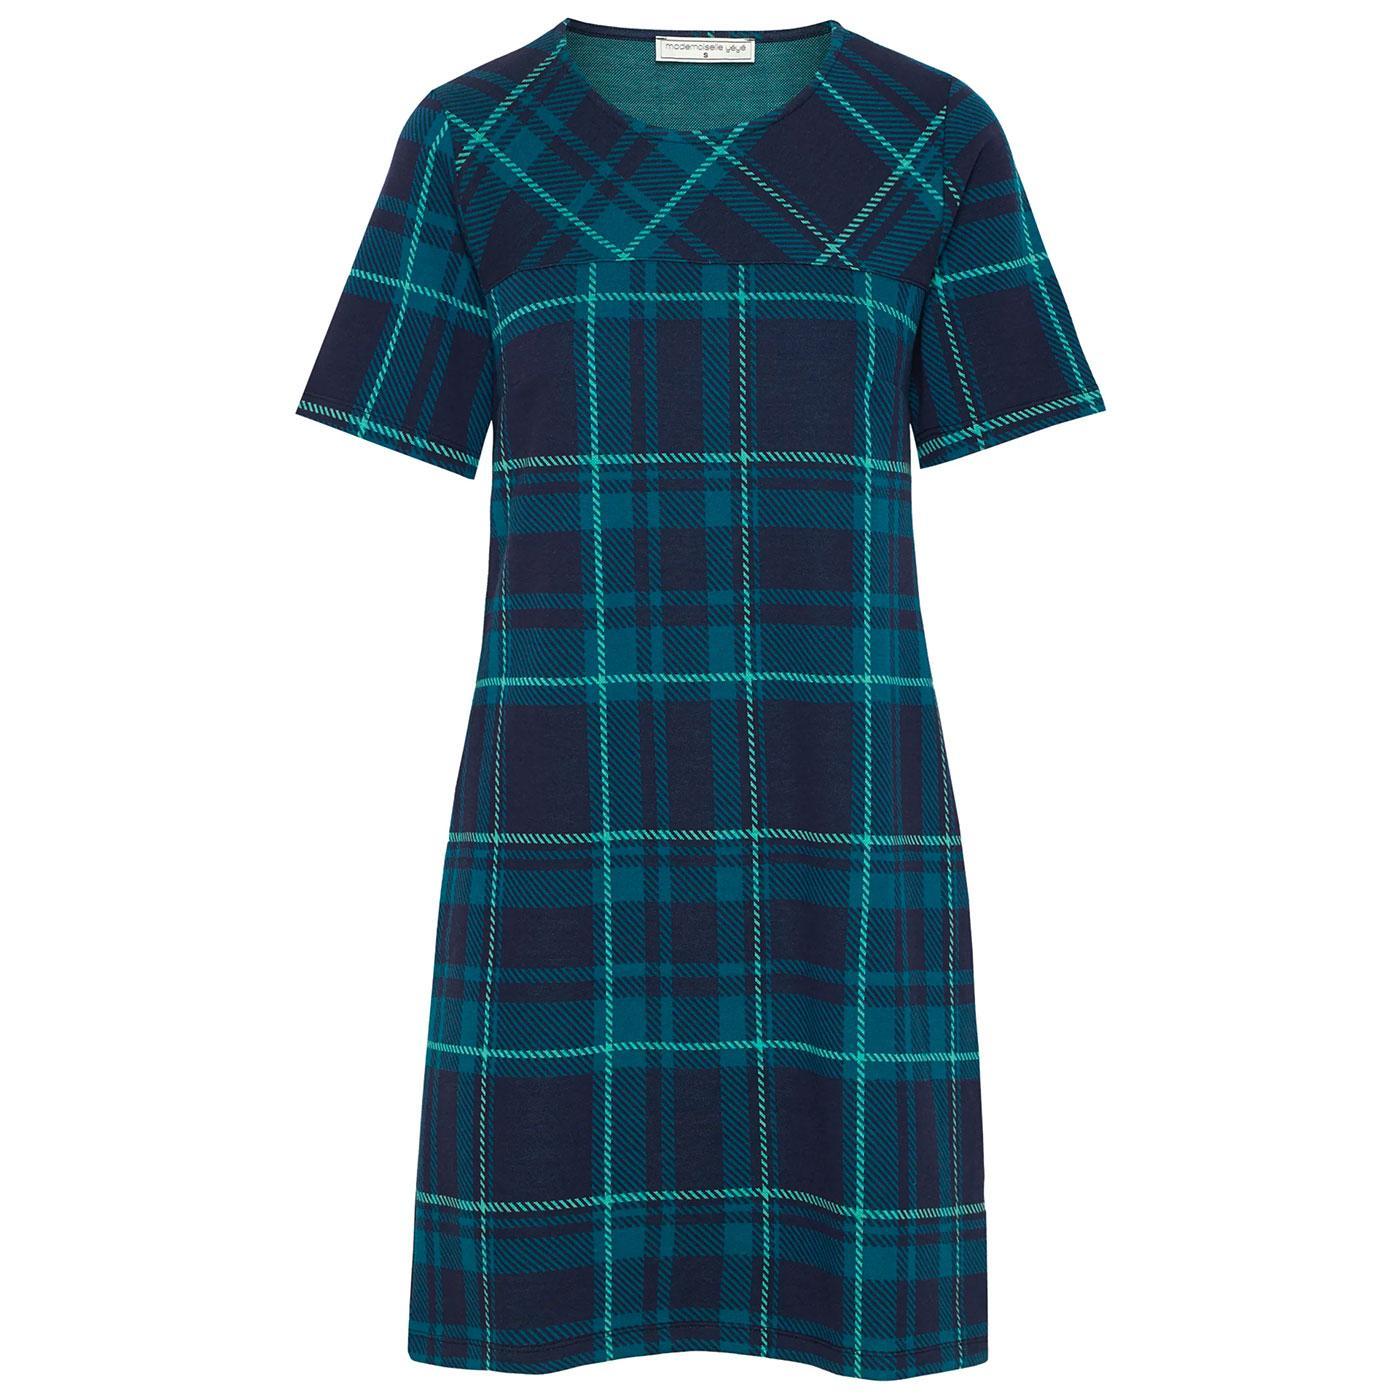 Because Maybe MADEMOISELLE YEYE Tartan Mod Dress